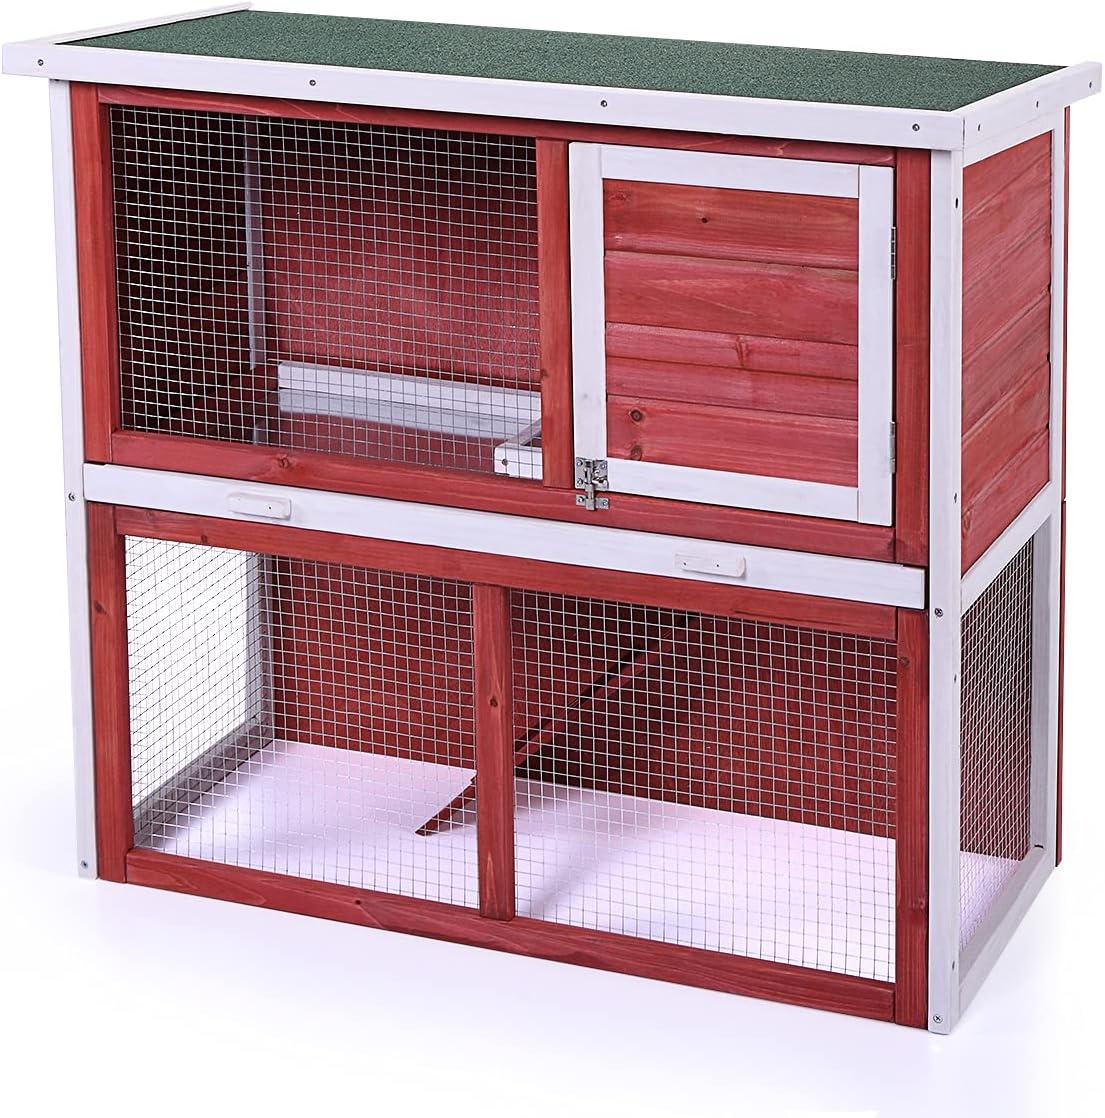 Upgrade Rabbit Hutch Cage Indoor Bu Weatherproof Outdoor Cheap mail order Ranking TOP12 sales